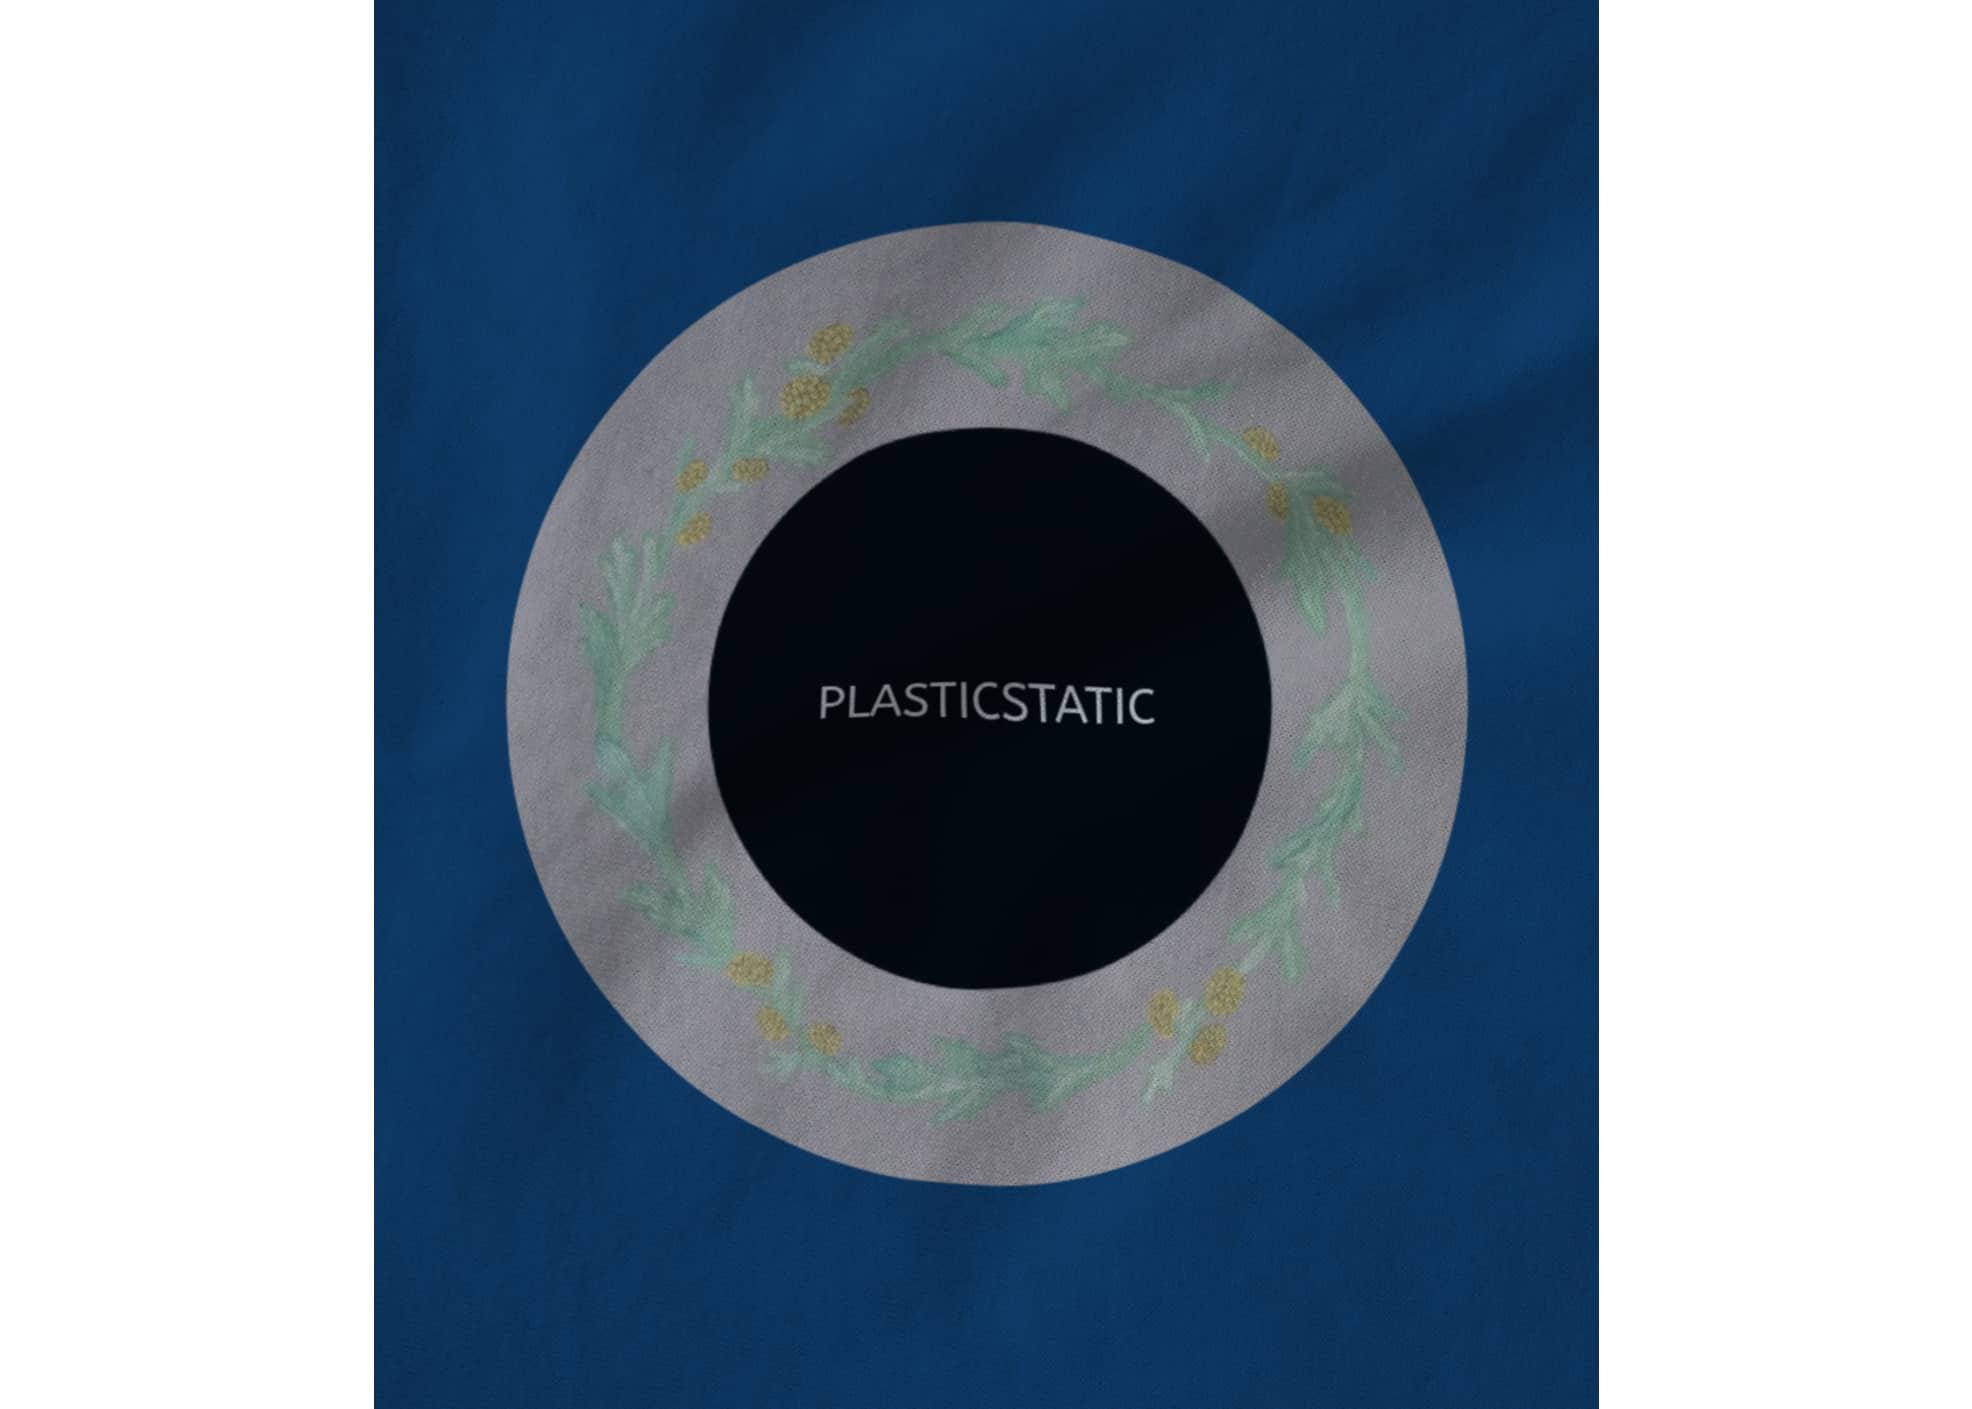 Plasticstatic retreat 1563649178